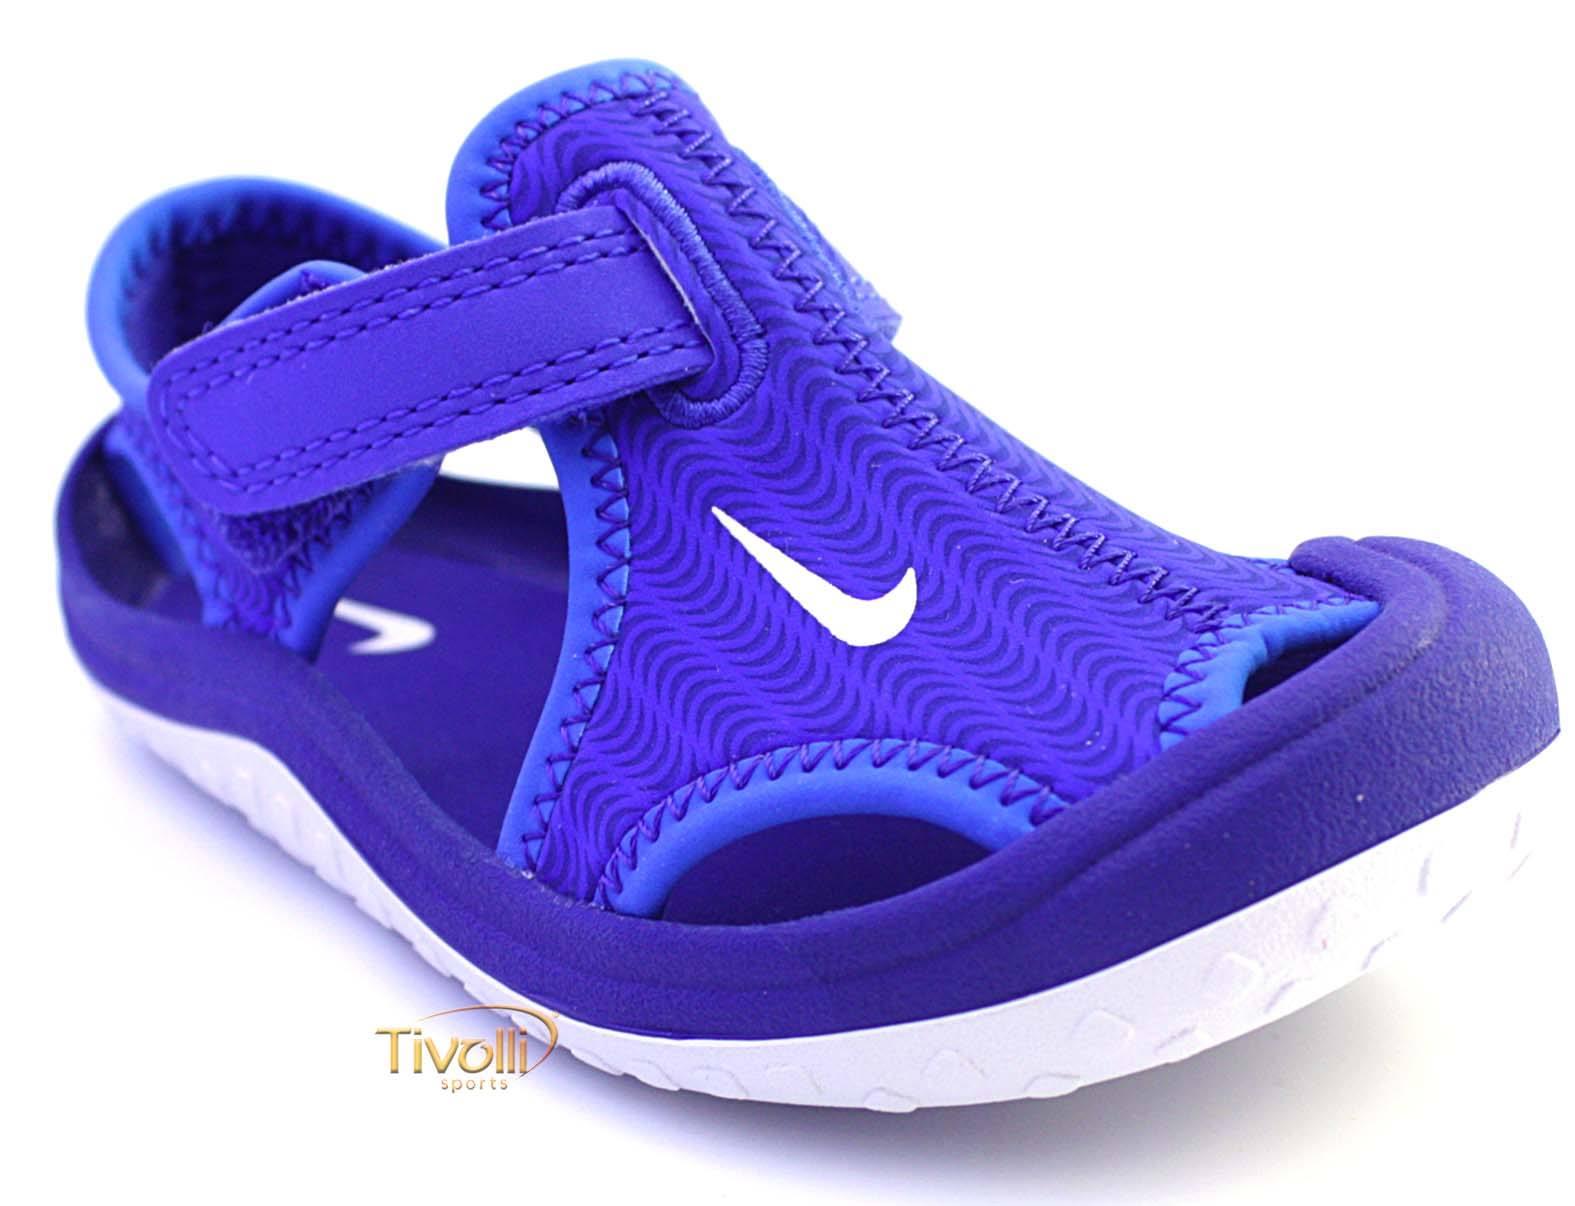 364465841 Sandália infantil Nike Sunray Protect (TDV) Papete Azul - Tamanhos 17,5 ao  26